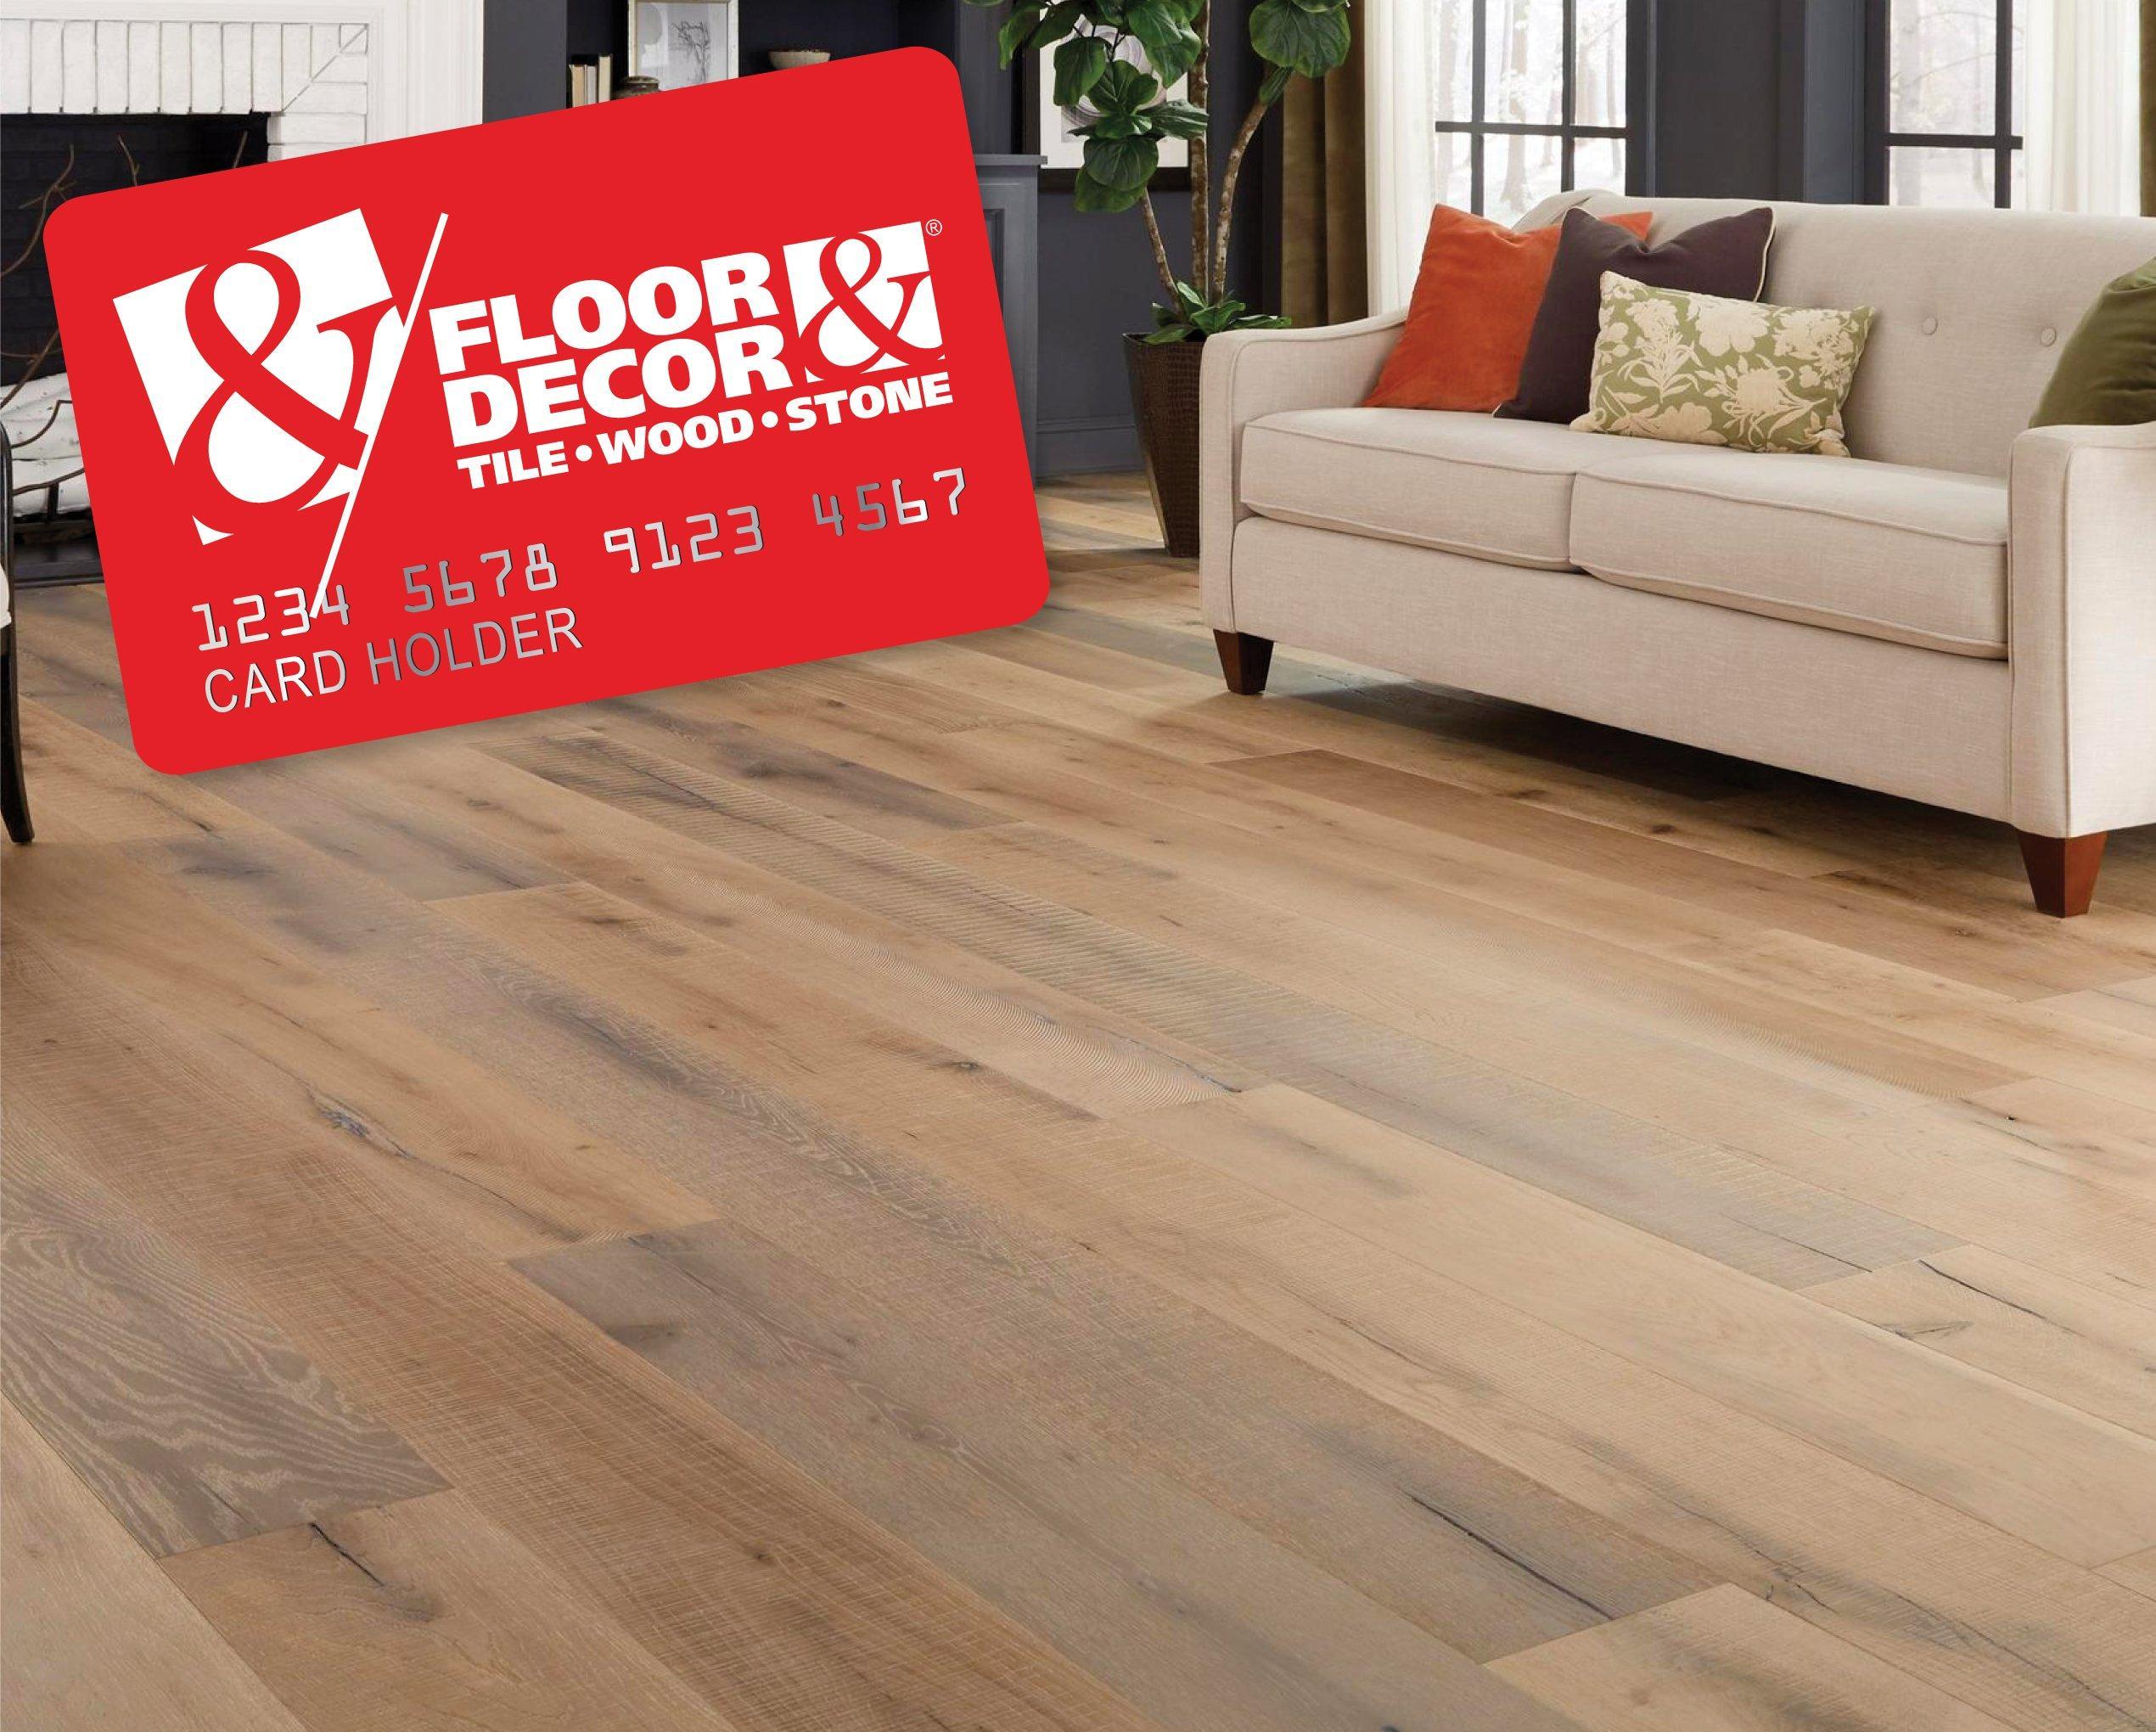 floor decor dallas fort worth floor